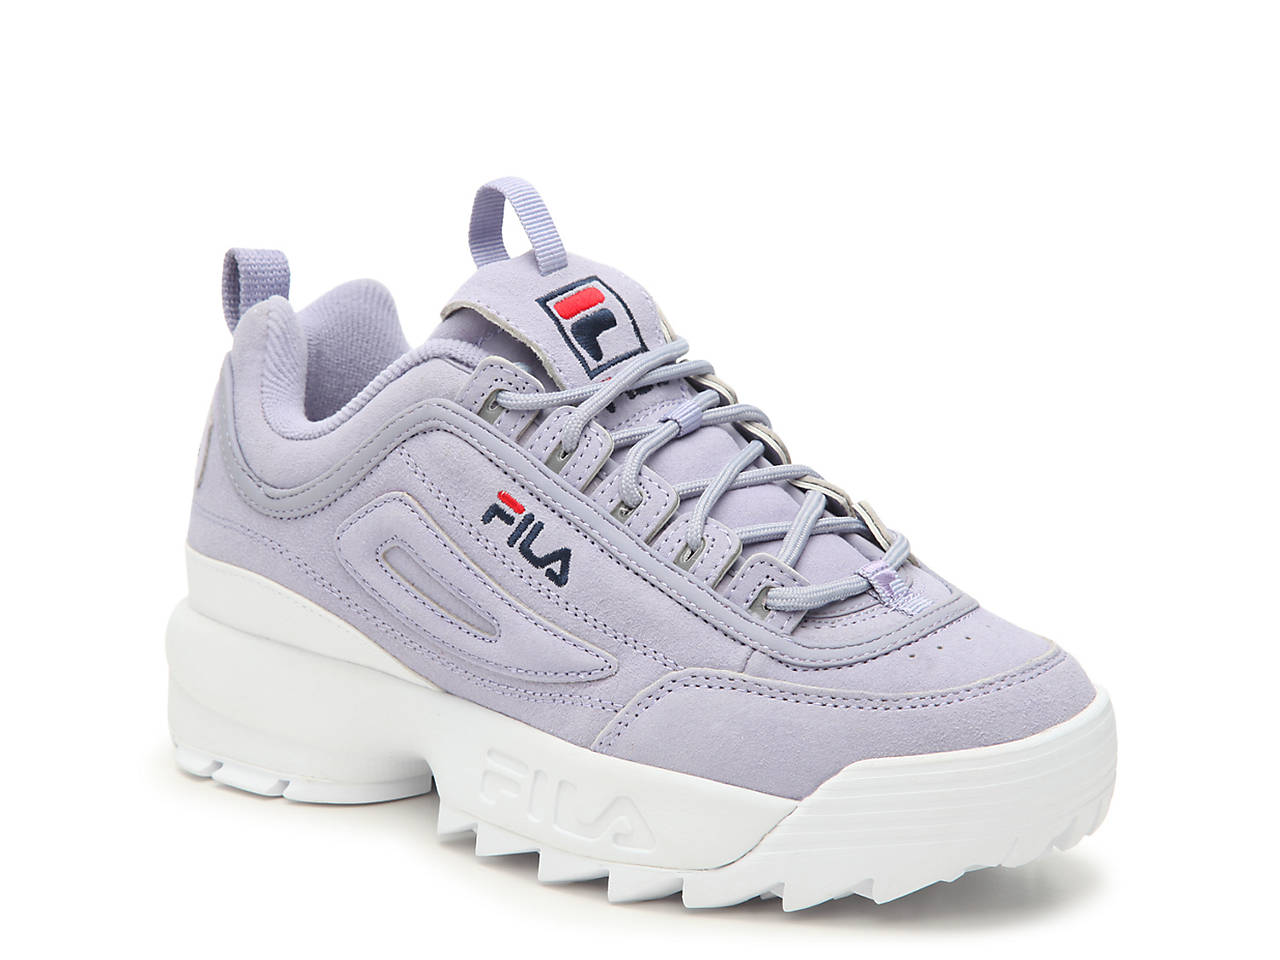 e49959fae14 Fila Disruptor II Premium Sneaker - Women's Women's Shoes | DSW